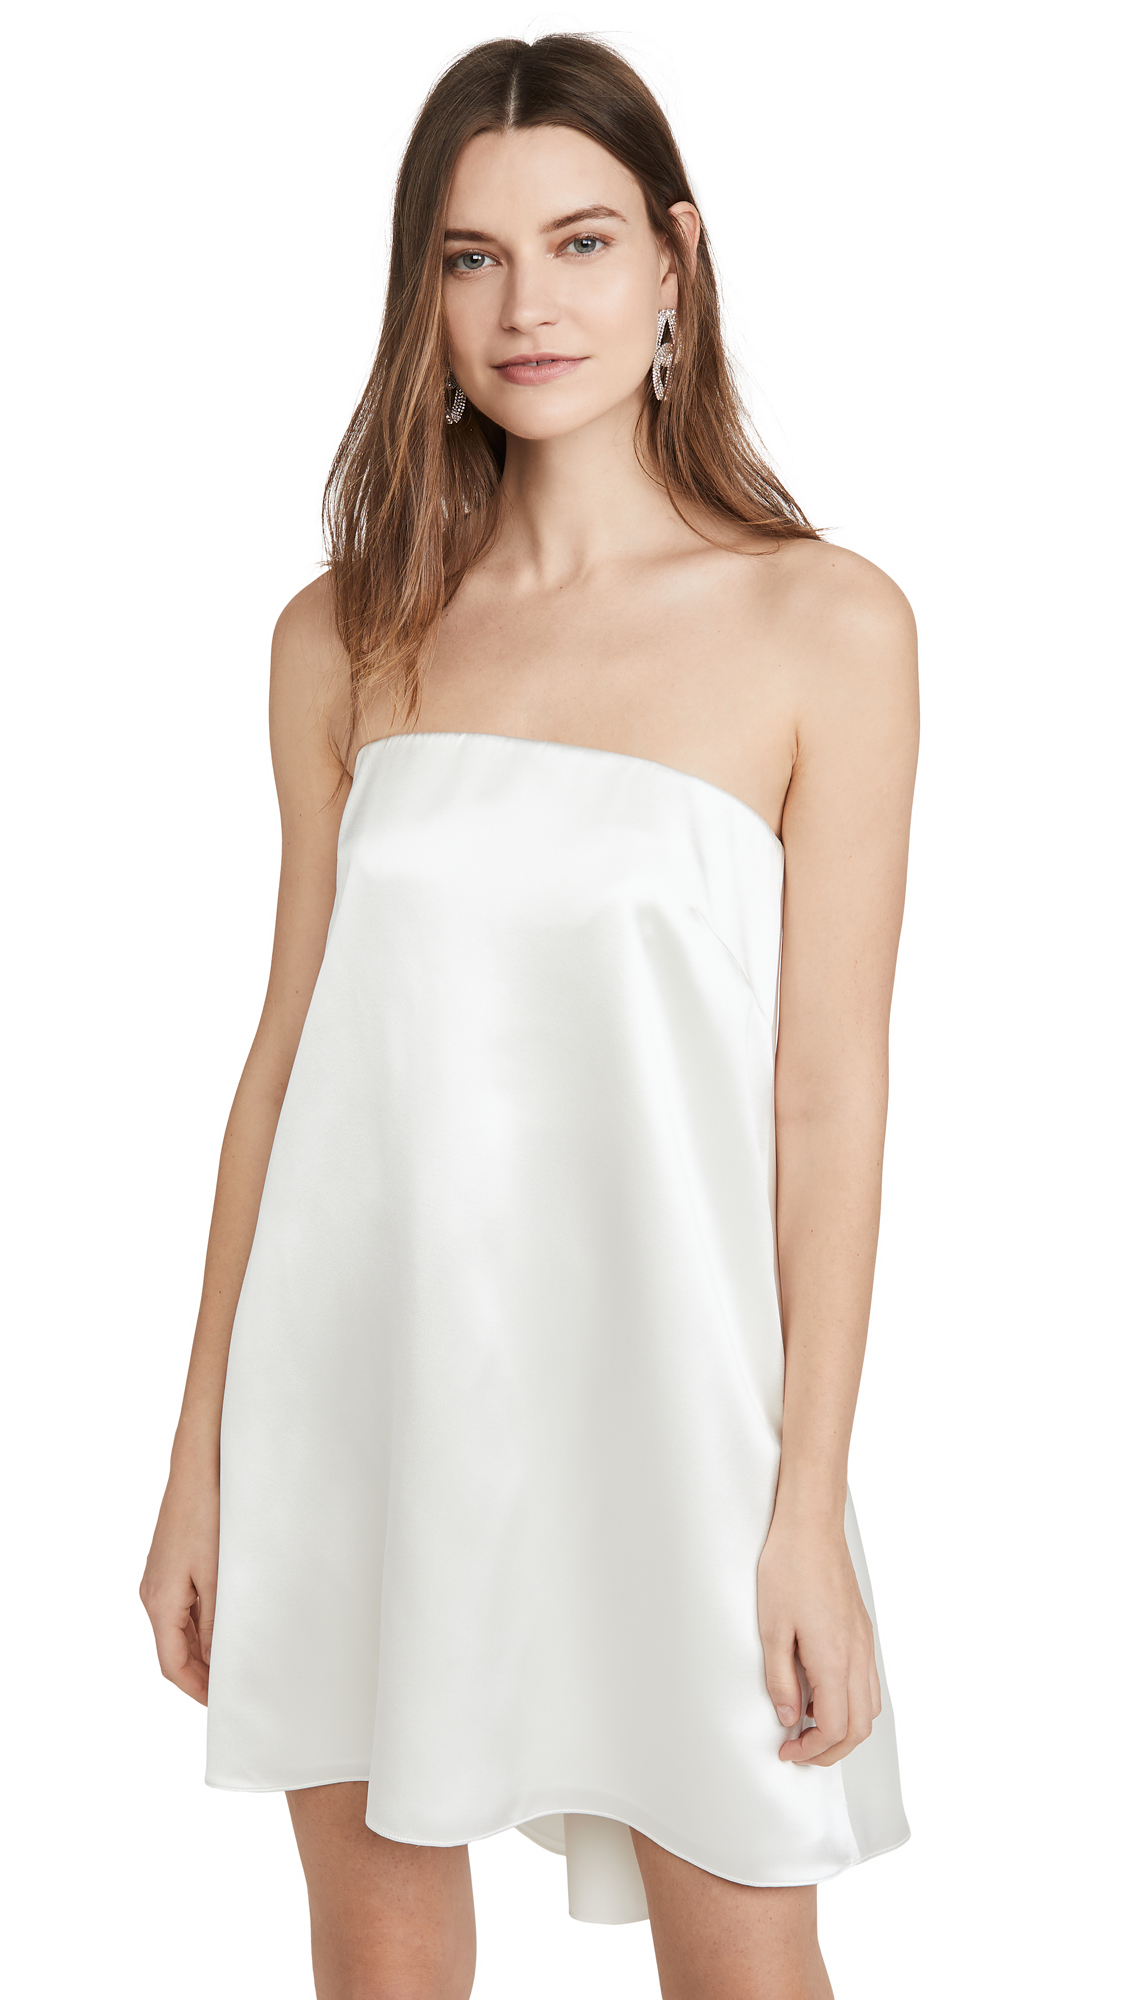 Buy Brandon Maxwell Crepe Back Satin Cocktail Dress online beautiful Brandon Maxwell Clothing, Dresses